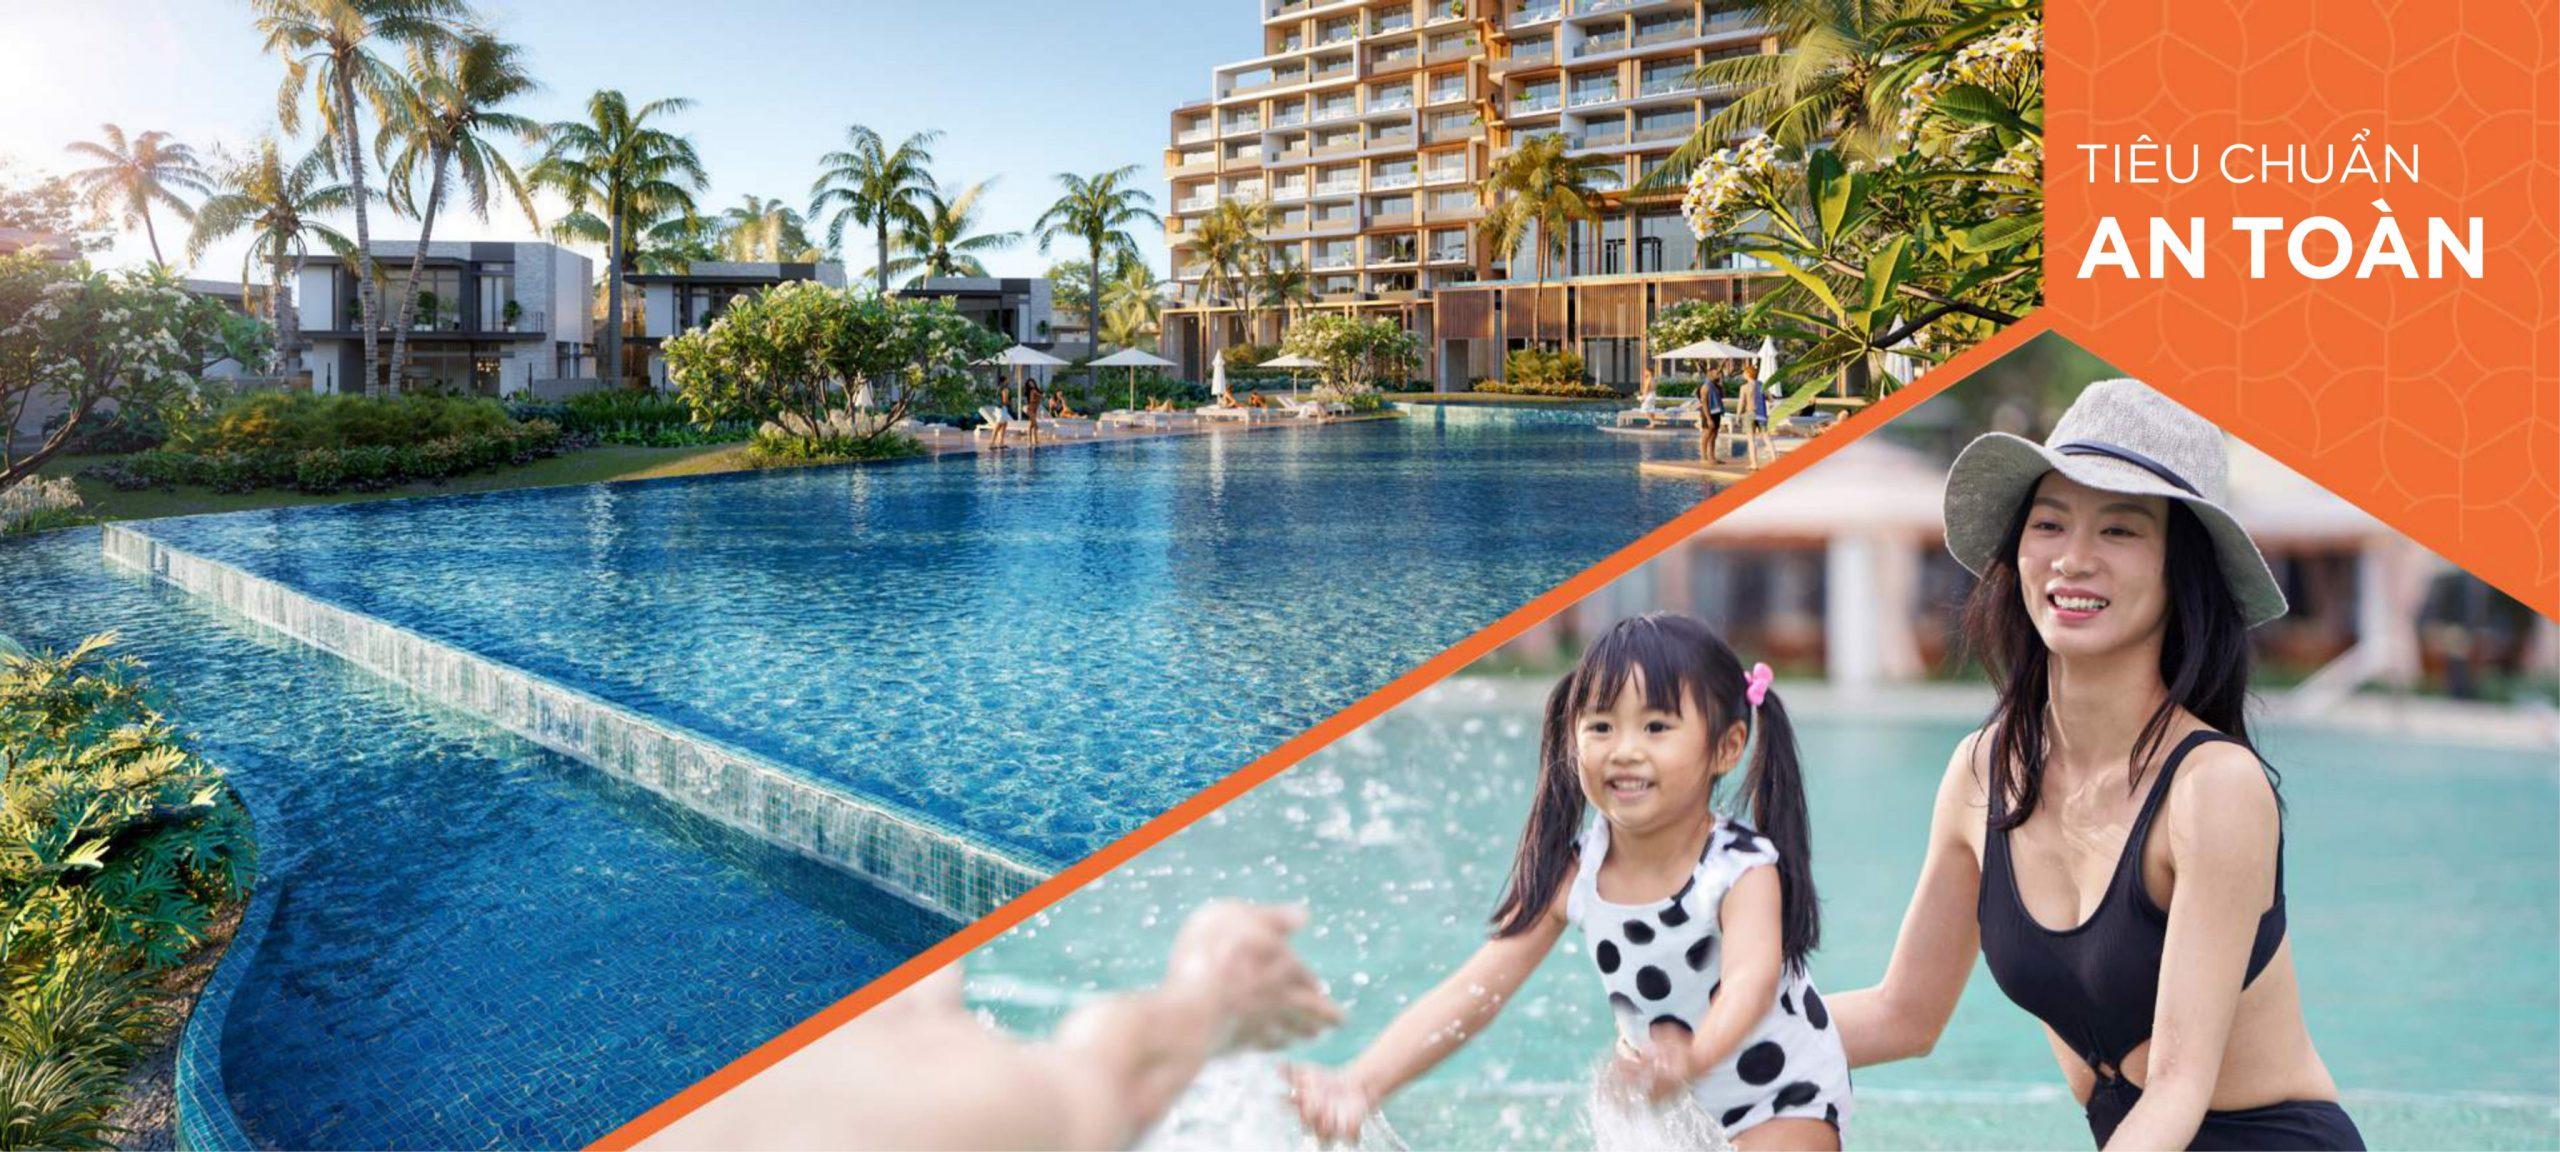 Dự án biệt thự Hyatt Regency Ho Tram Residences giá từ 15 tỷ/căn